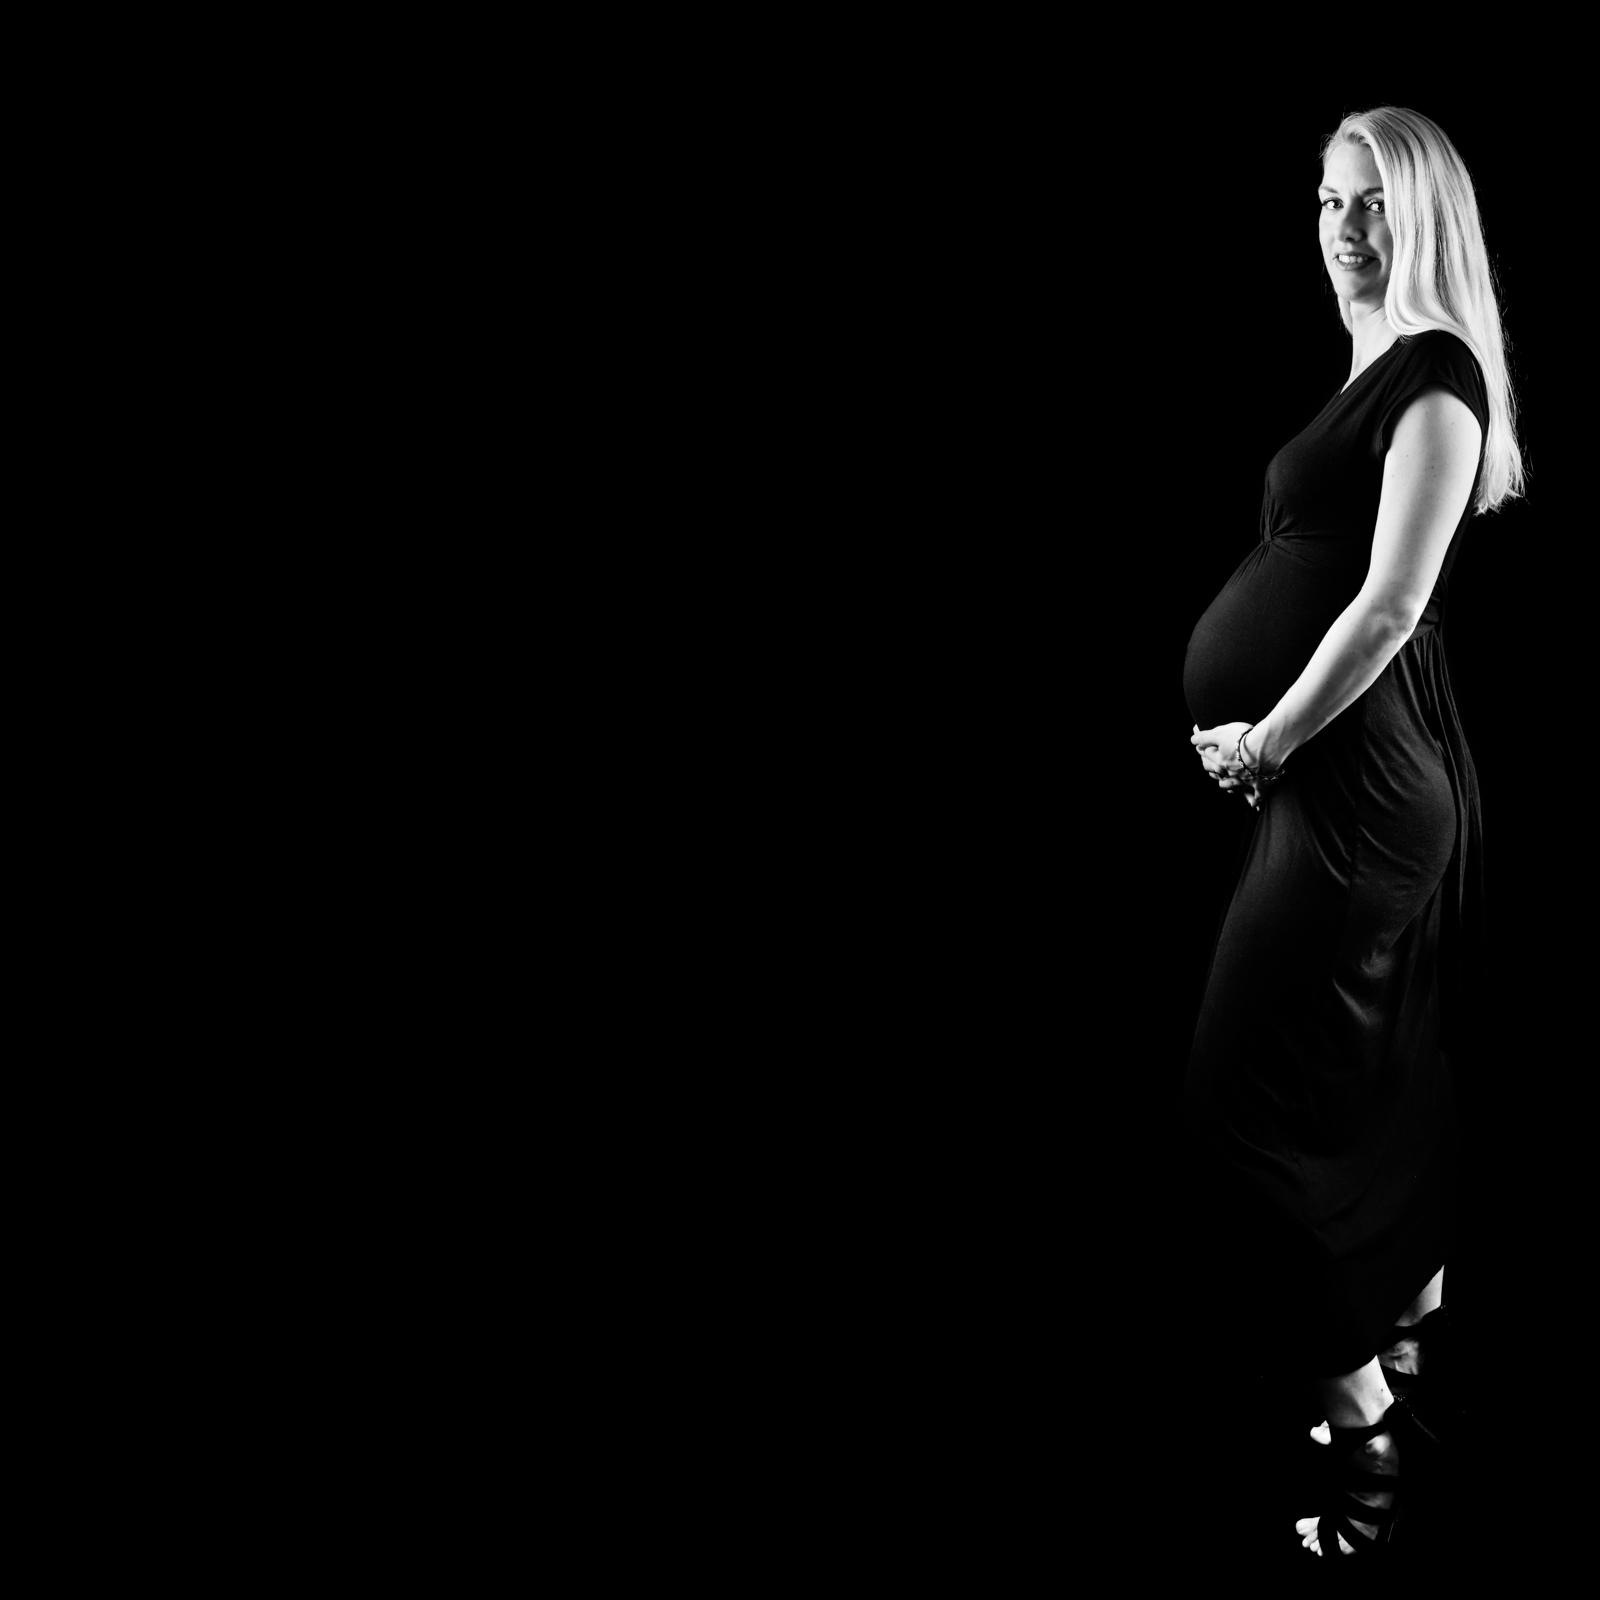 zwangerschap fotografie stijlvol zwangerschap foto zwart wit foto bolle buik foto Zalmiy Paeez Fotografie Haarlem Heemstede